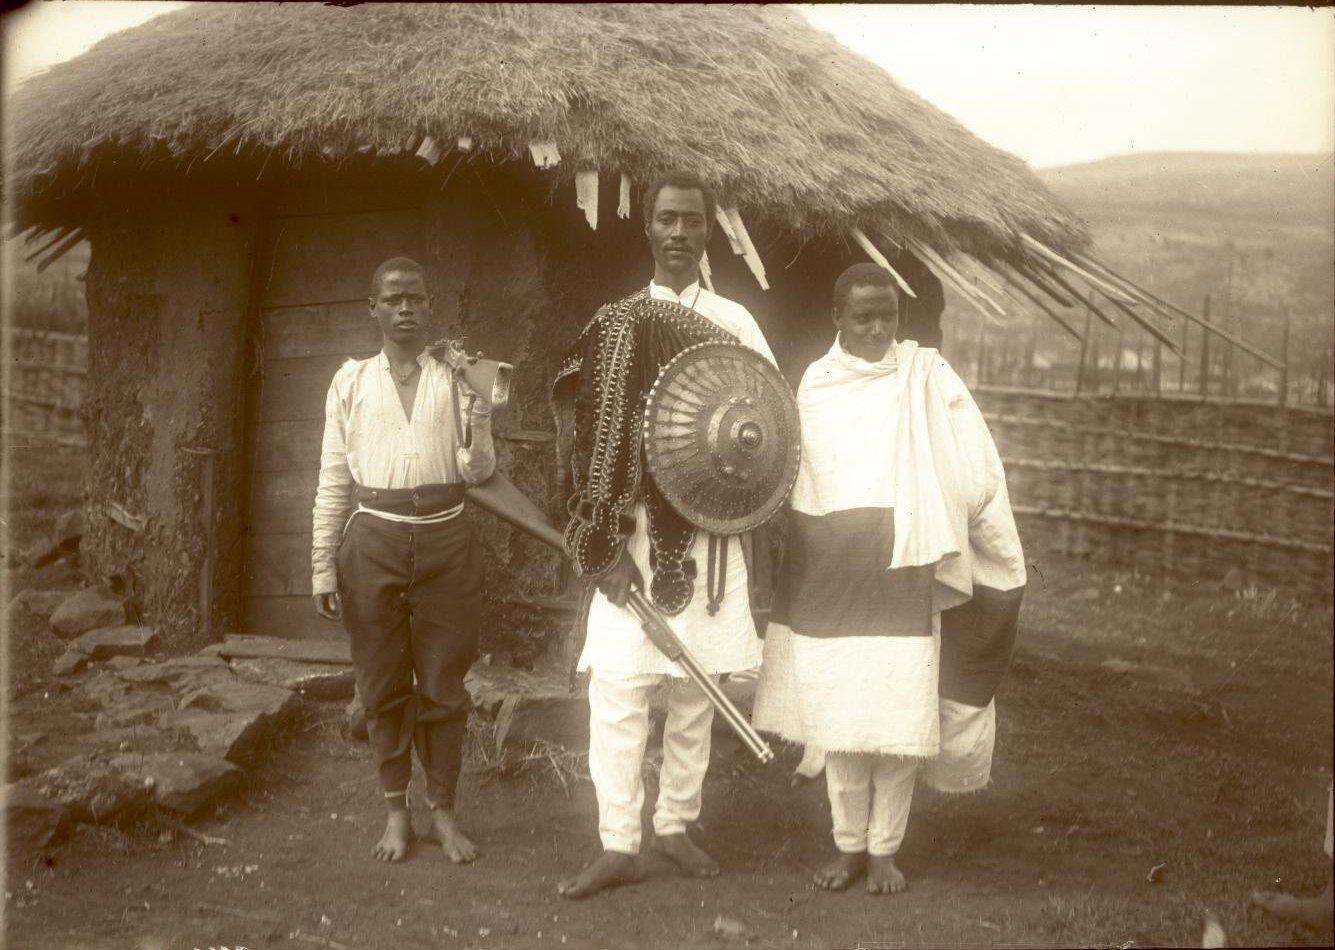 371. 1899. Абиссиния, Аддис-Абеба. Господин Гано с ашкером (солдатом)